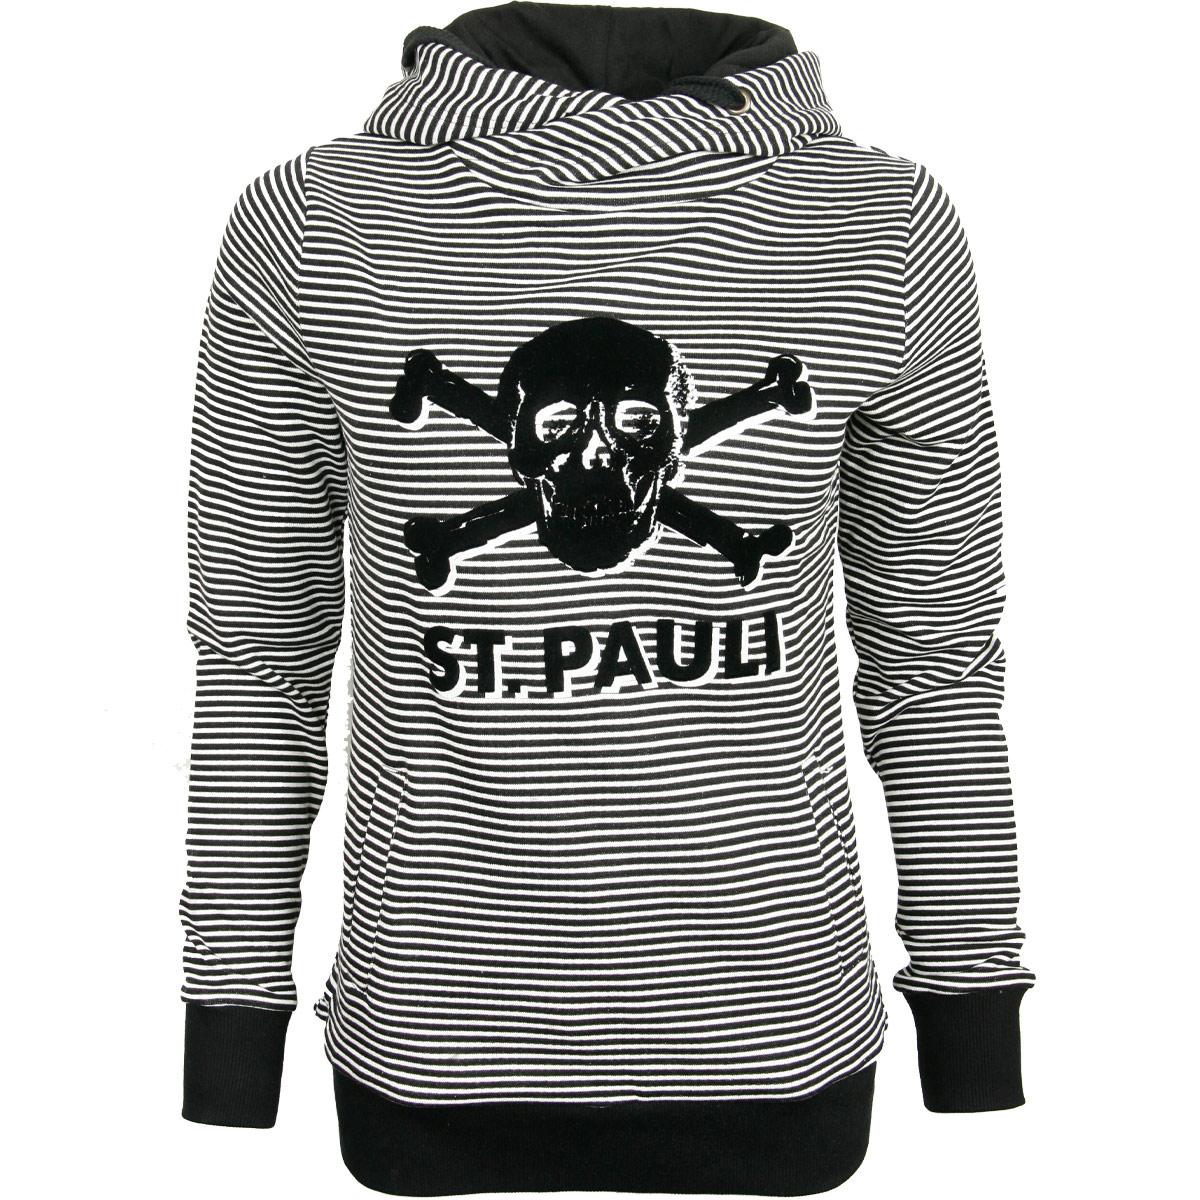 FC St. Pauli - Damen Kapuzenpullover Stripe Terry Totenkopf - schwarz-weiß